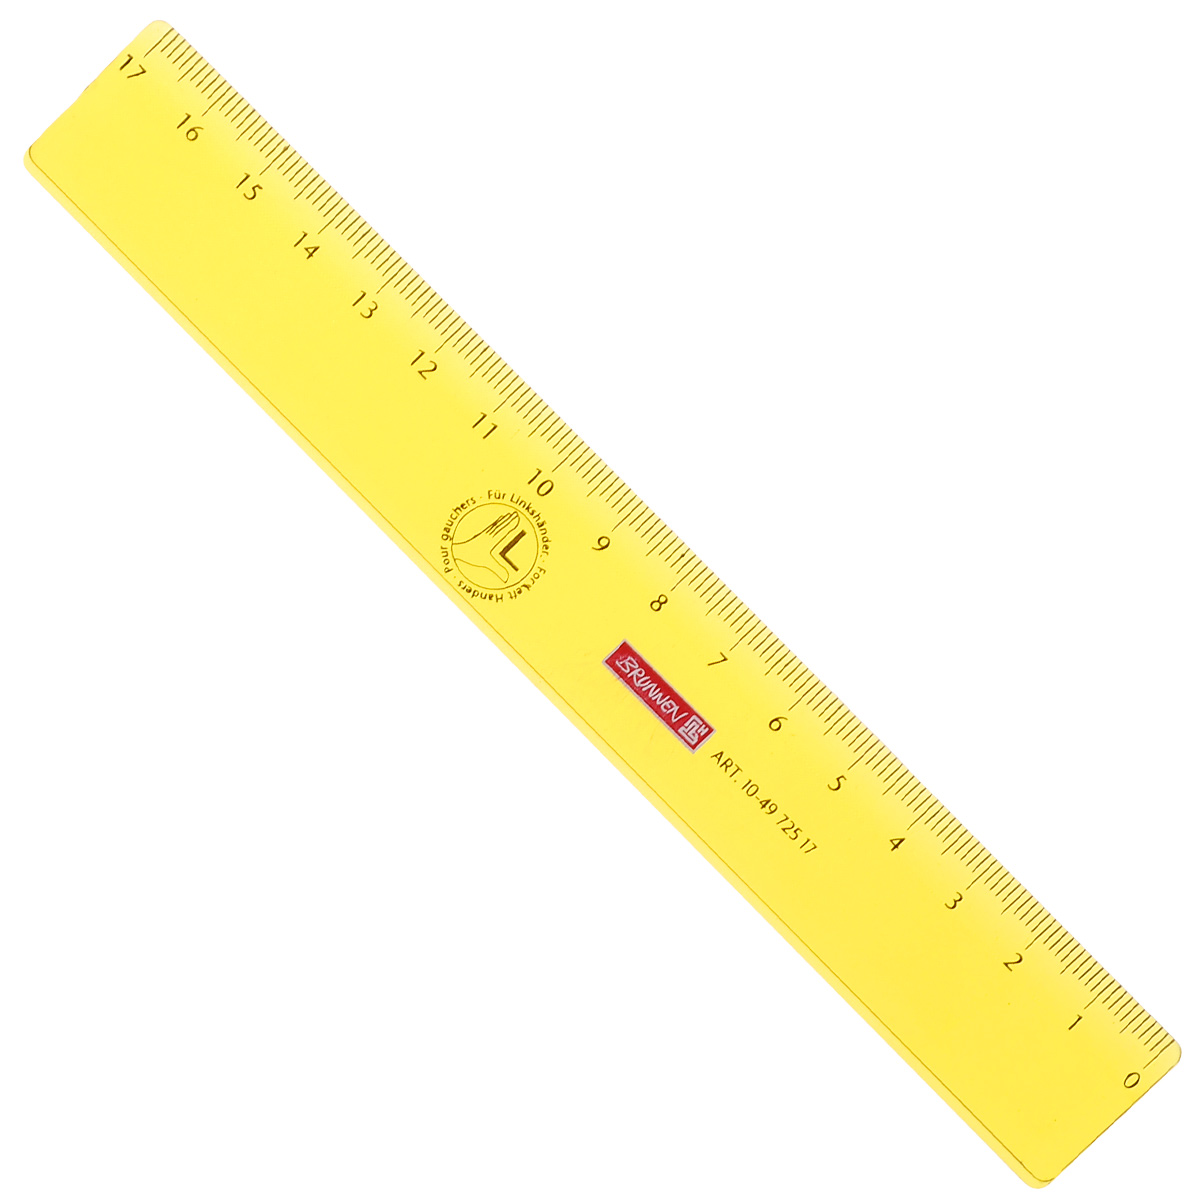 Линейка для левши Brunnen, цвет: желтый, 17 см brunnen линейка для левши цвет красный 17 см